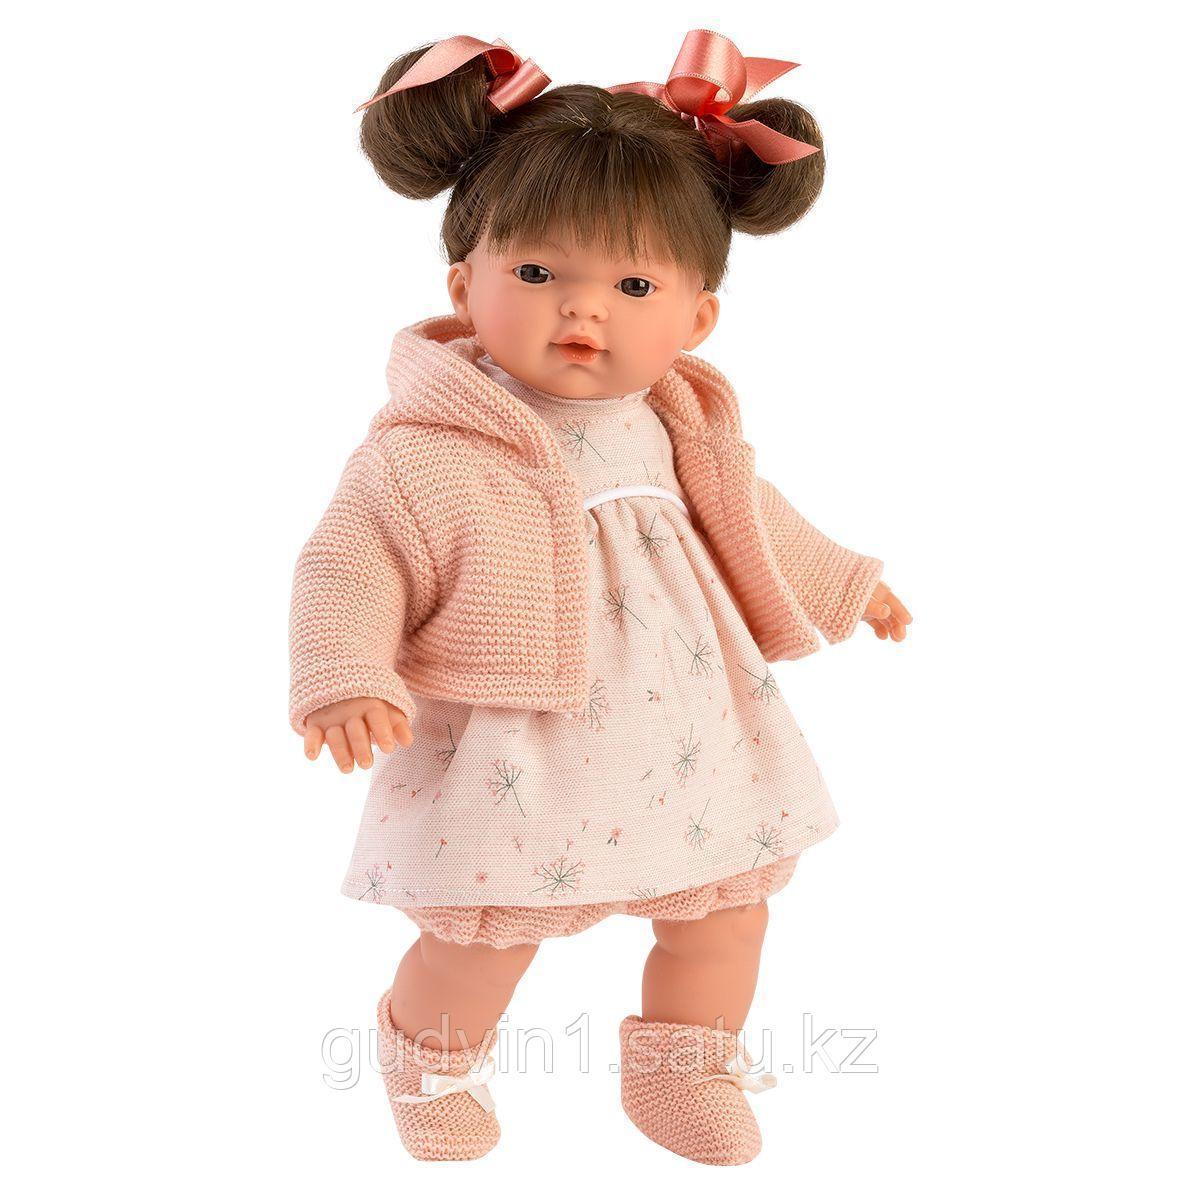 LLORENS: Кукла Рита 33 см., брюнетка в розовом жакете 33126